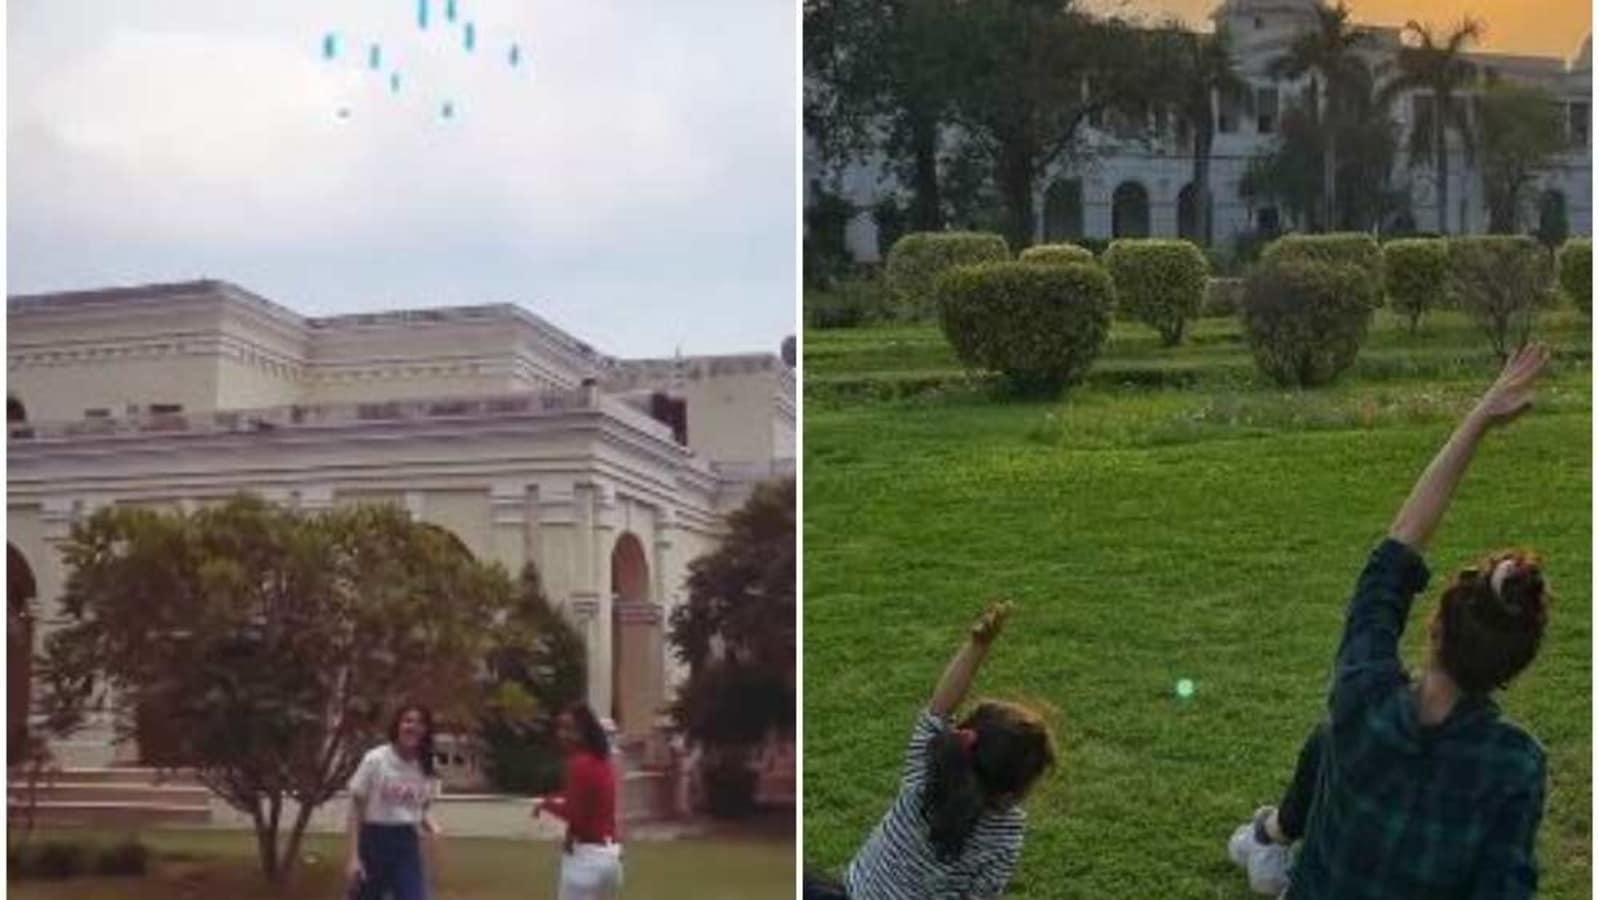 Soha Ali Khan and Inaaya take over Pataudi Palace grounds, live their best life. See pics - Hindustan Times